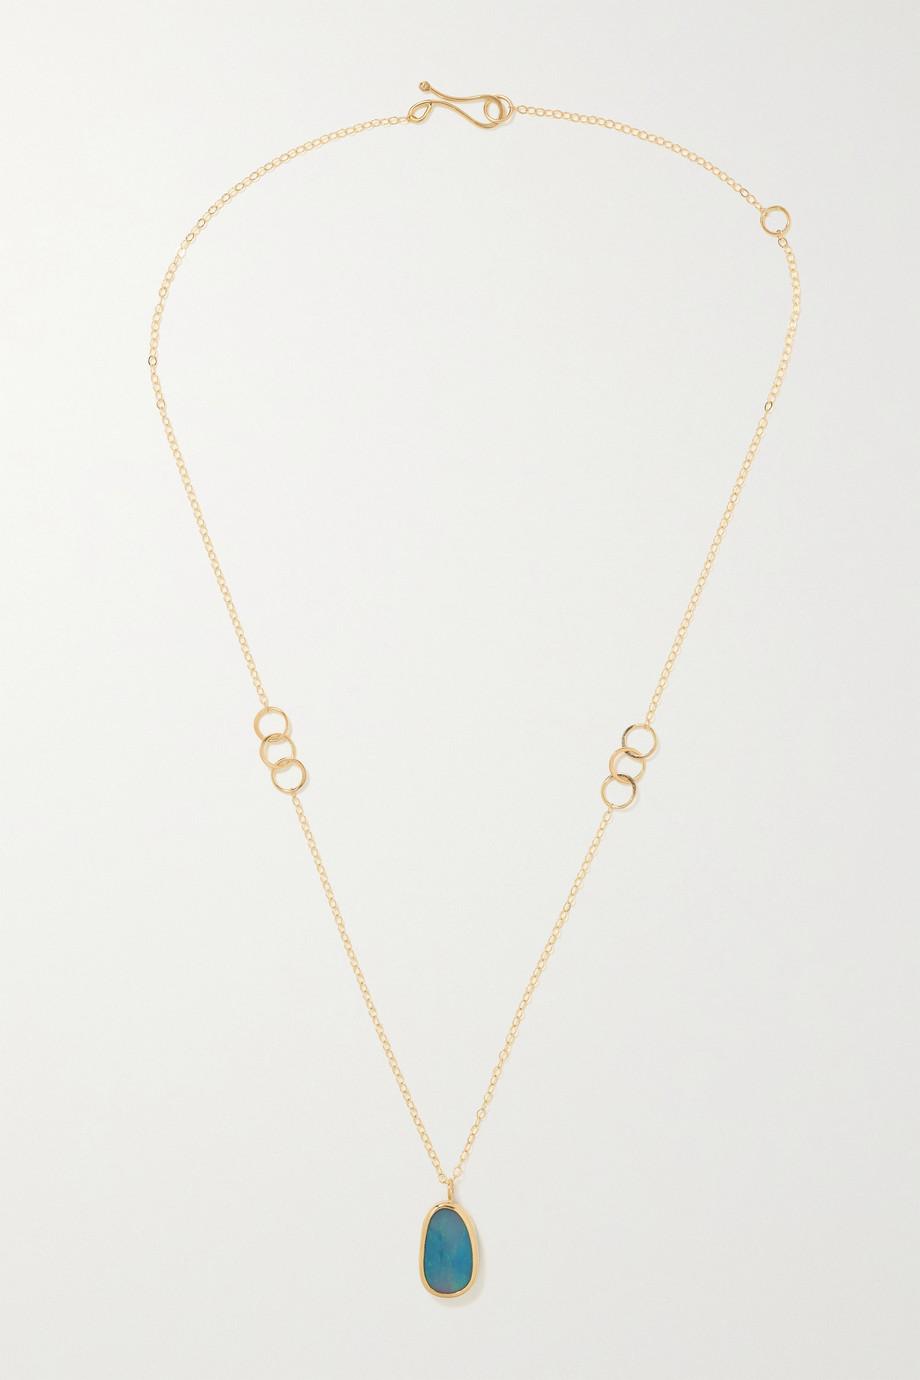 Melissa Joy Manning 14-karat recycled gold opal necklace